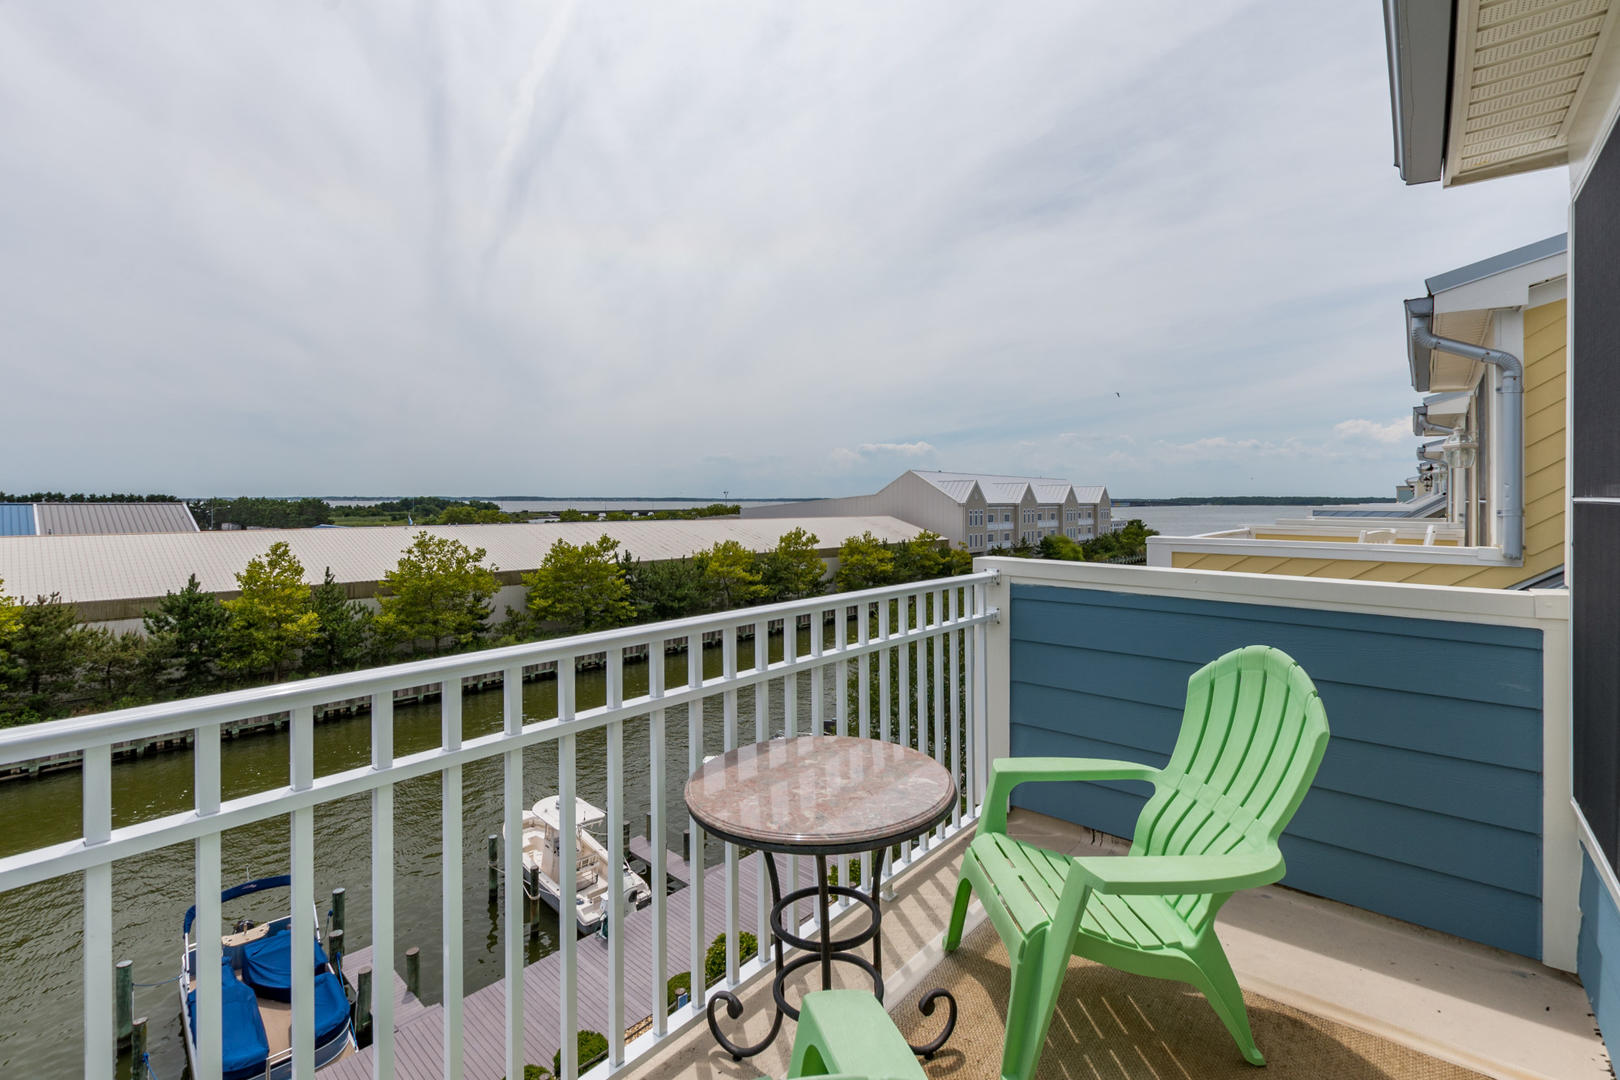 Sunset Island 43 Island Edge Dr. - Balcony off of Bedroom 2